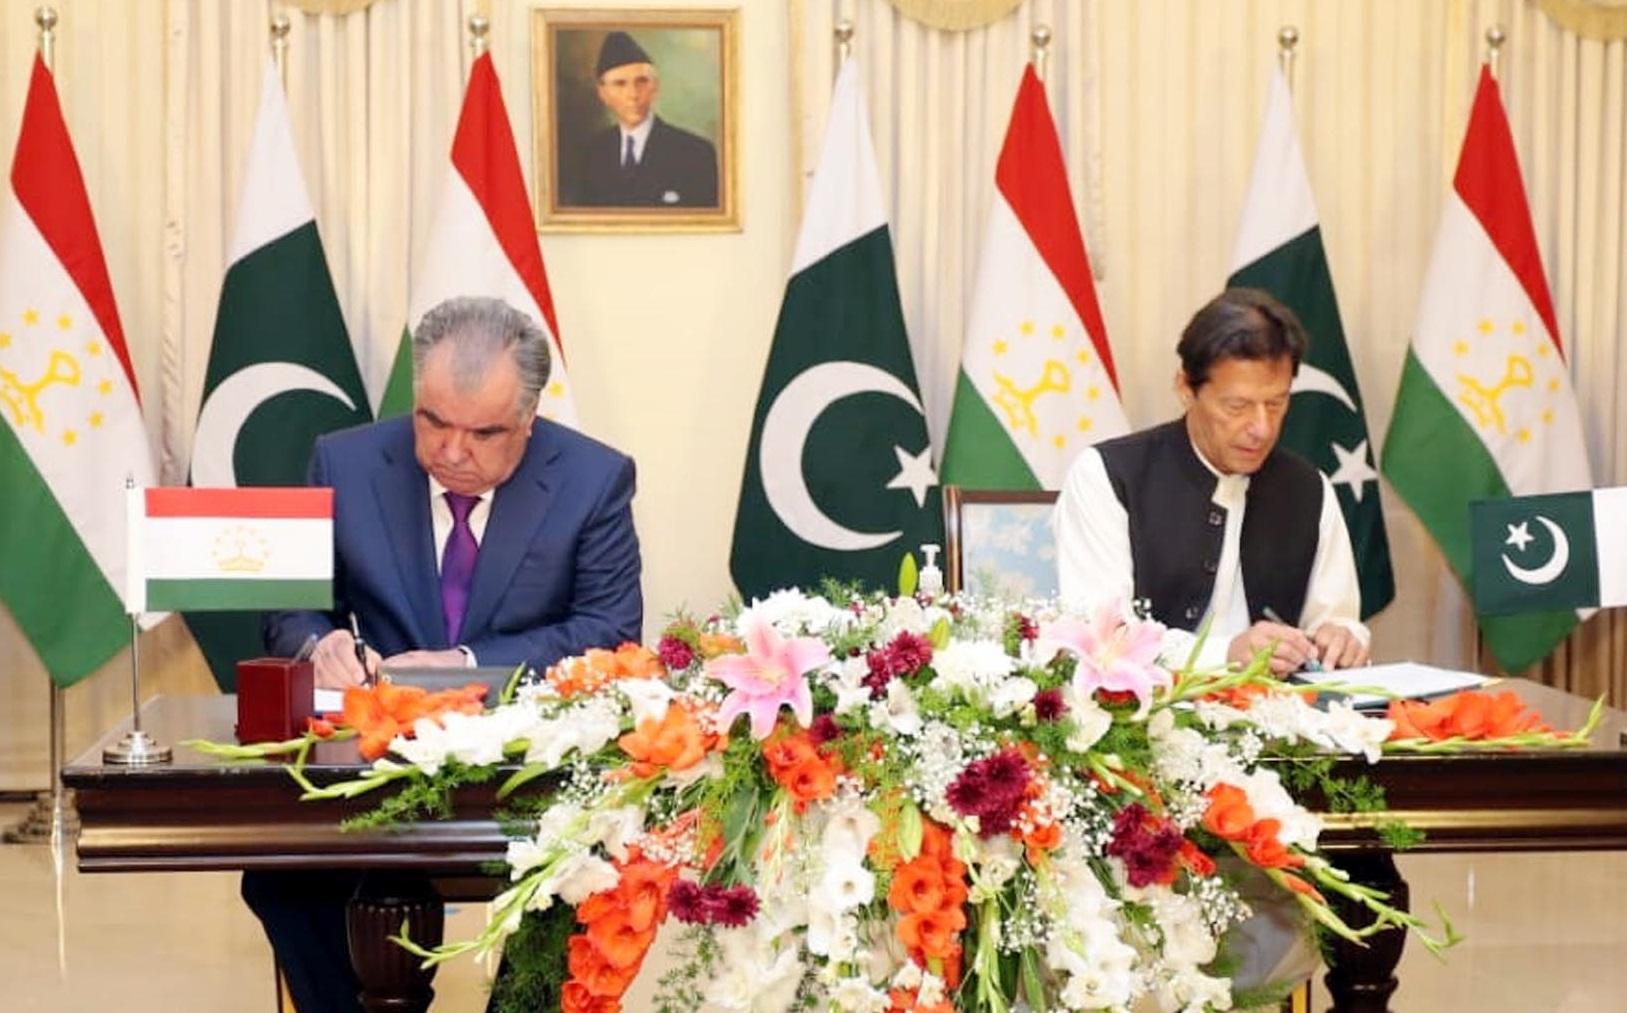 Pak-Tajik ties getting stronger with economic growth